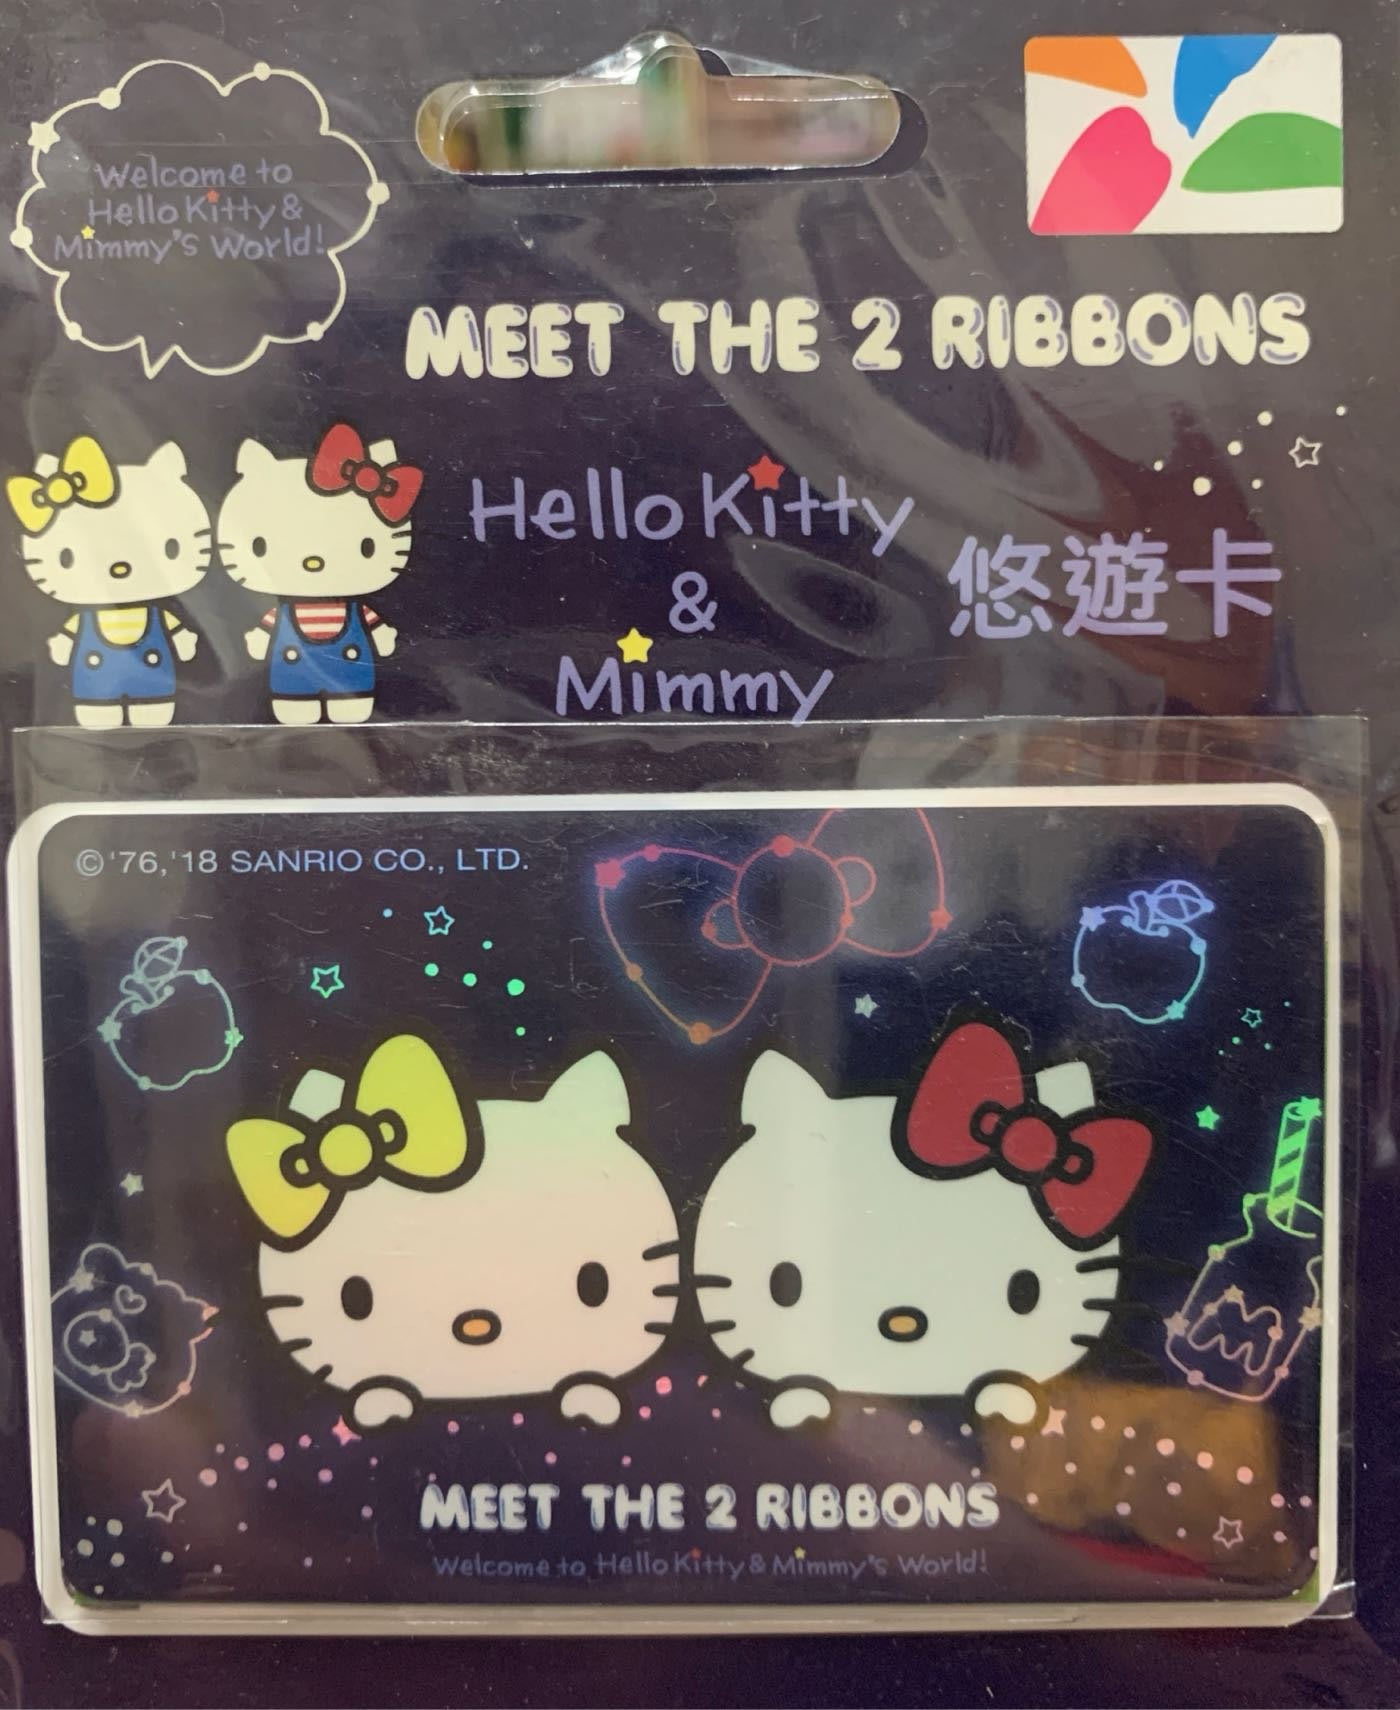 Hello kitty 雙緞帶 星河閃卡 (大臉版)  凱蒂貓 HelloKitty 悠遊卡 三麗鷗 悠遊卡